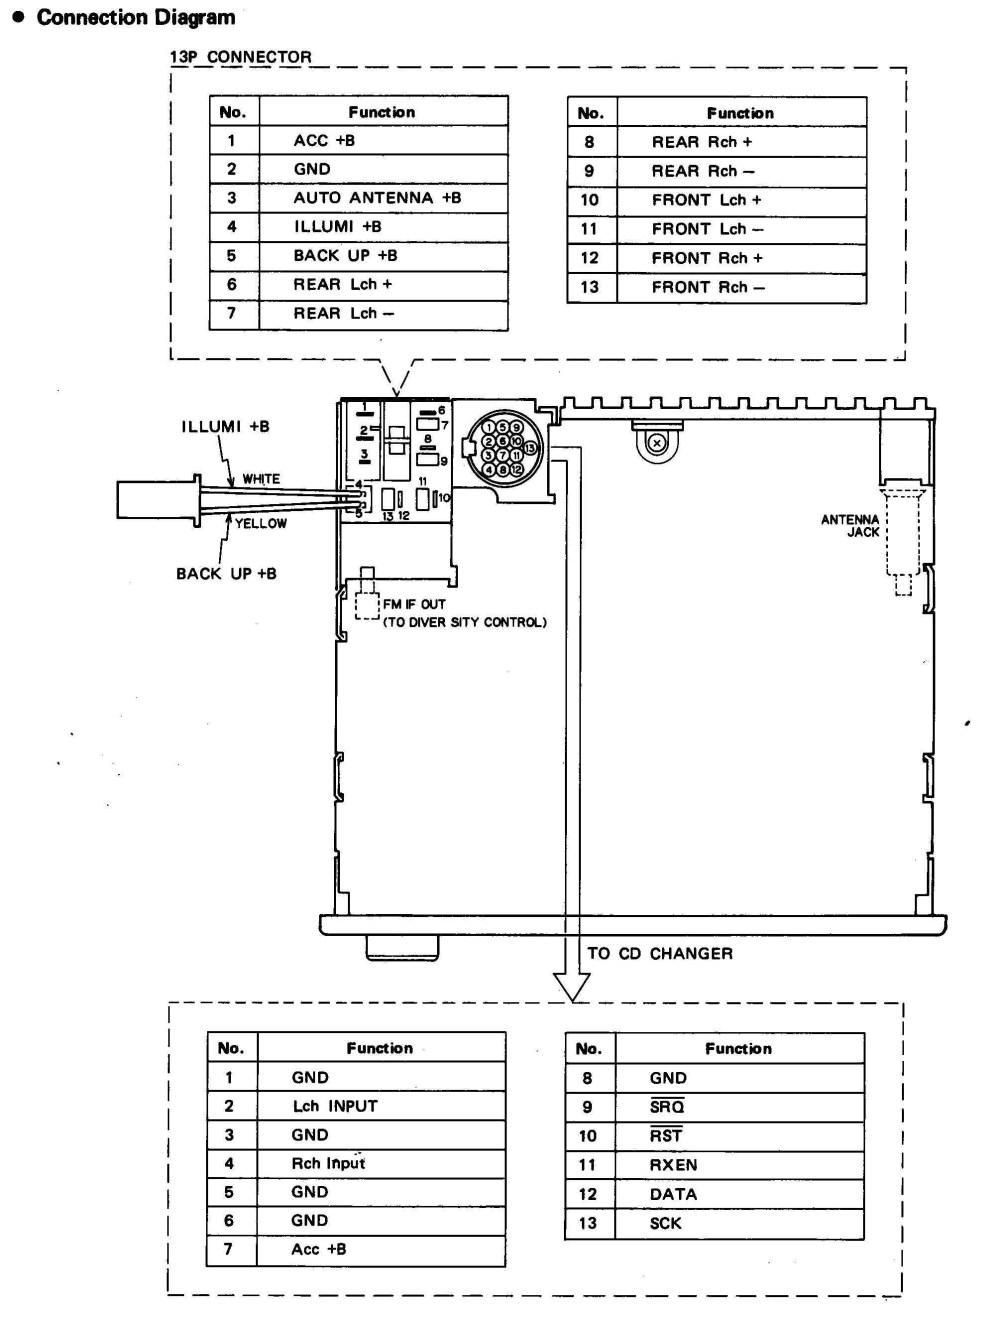 medium resolution of bmw 325i plug wiring diagram electrical diagram schematics 2003 bmw 325i radio wire diagram 1989 bmw